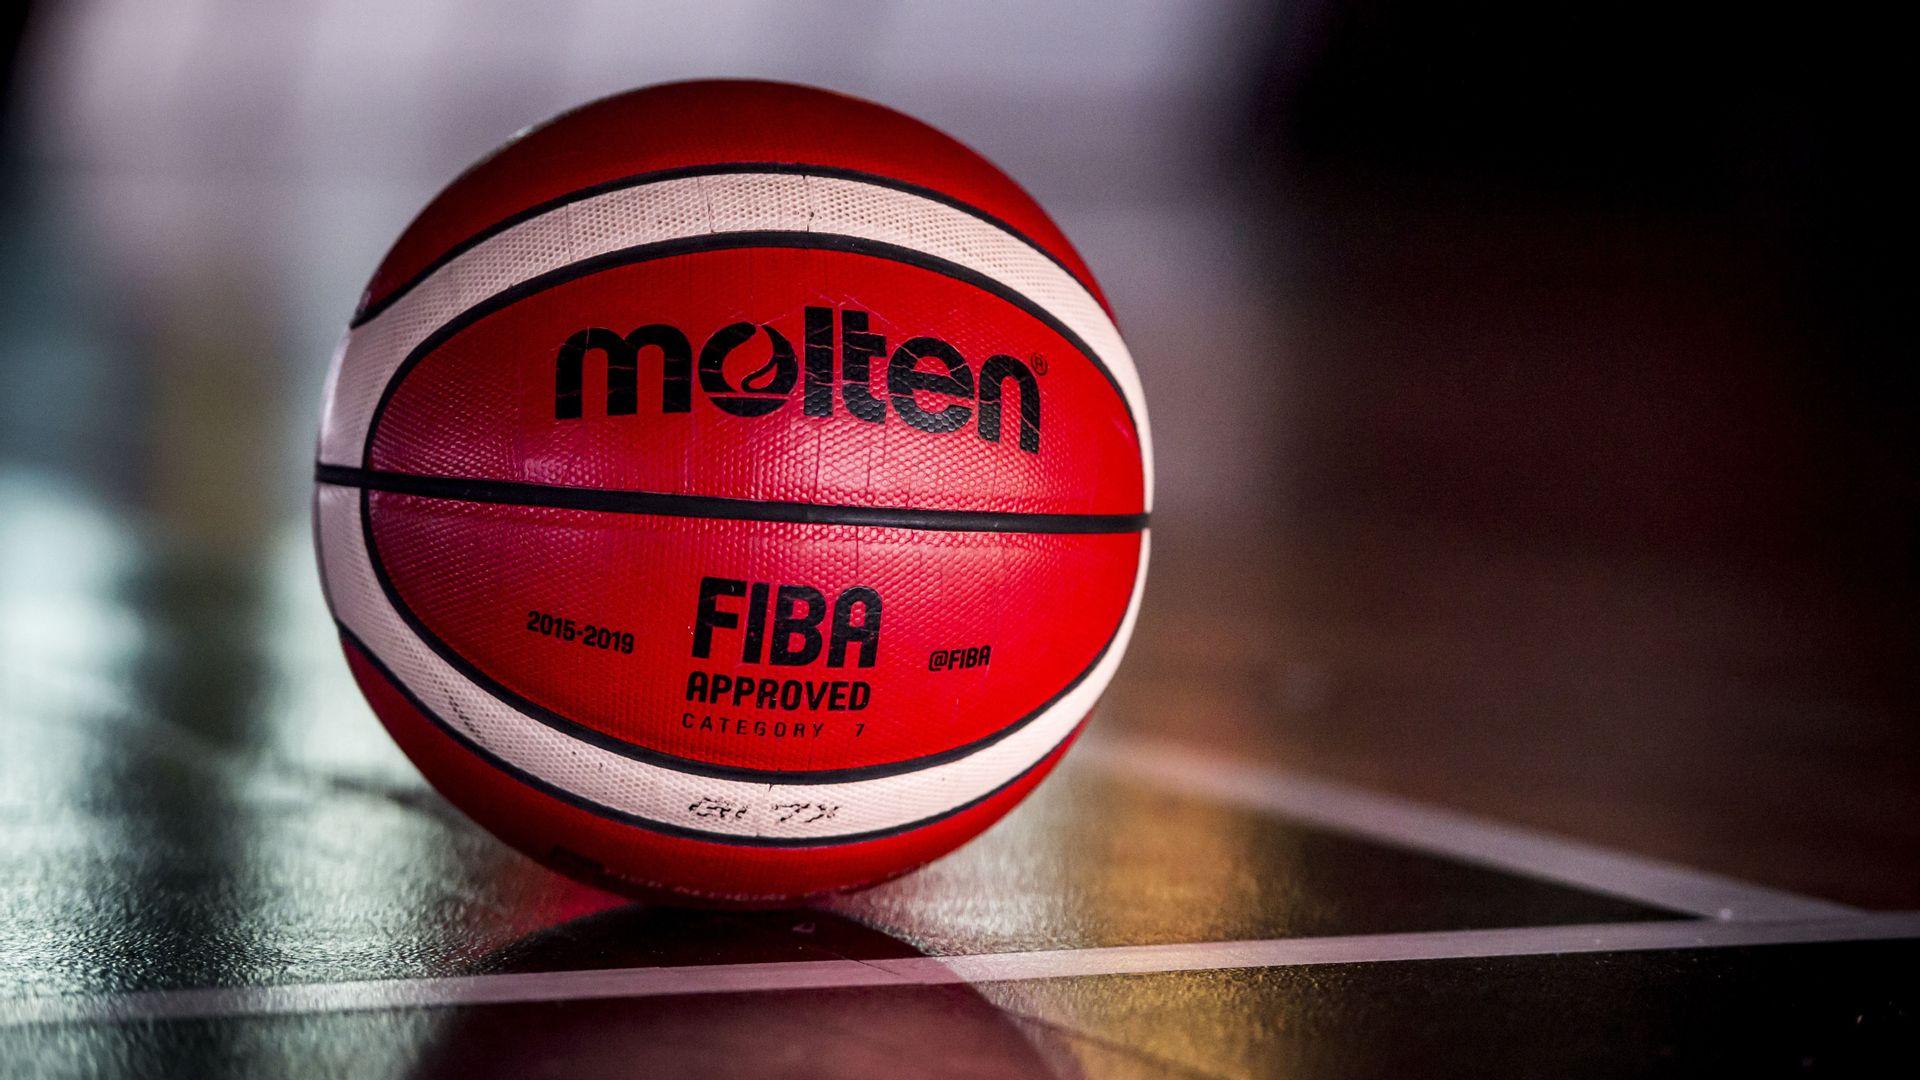 Basketball weiblich - Basketb.weibl.